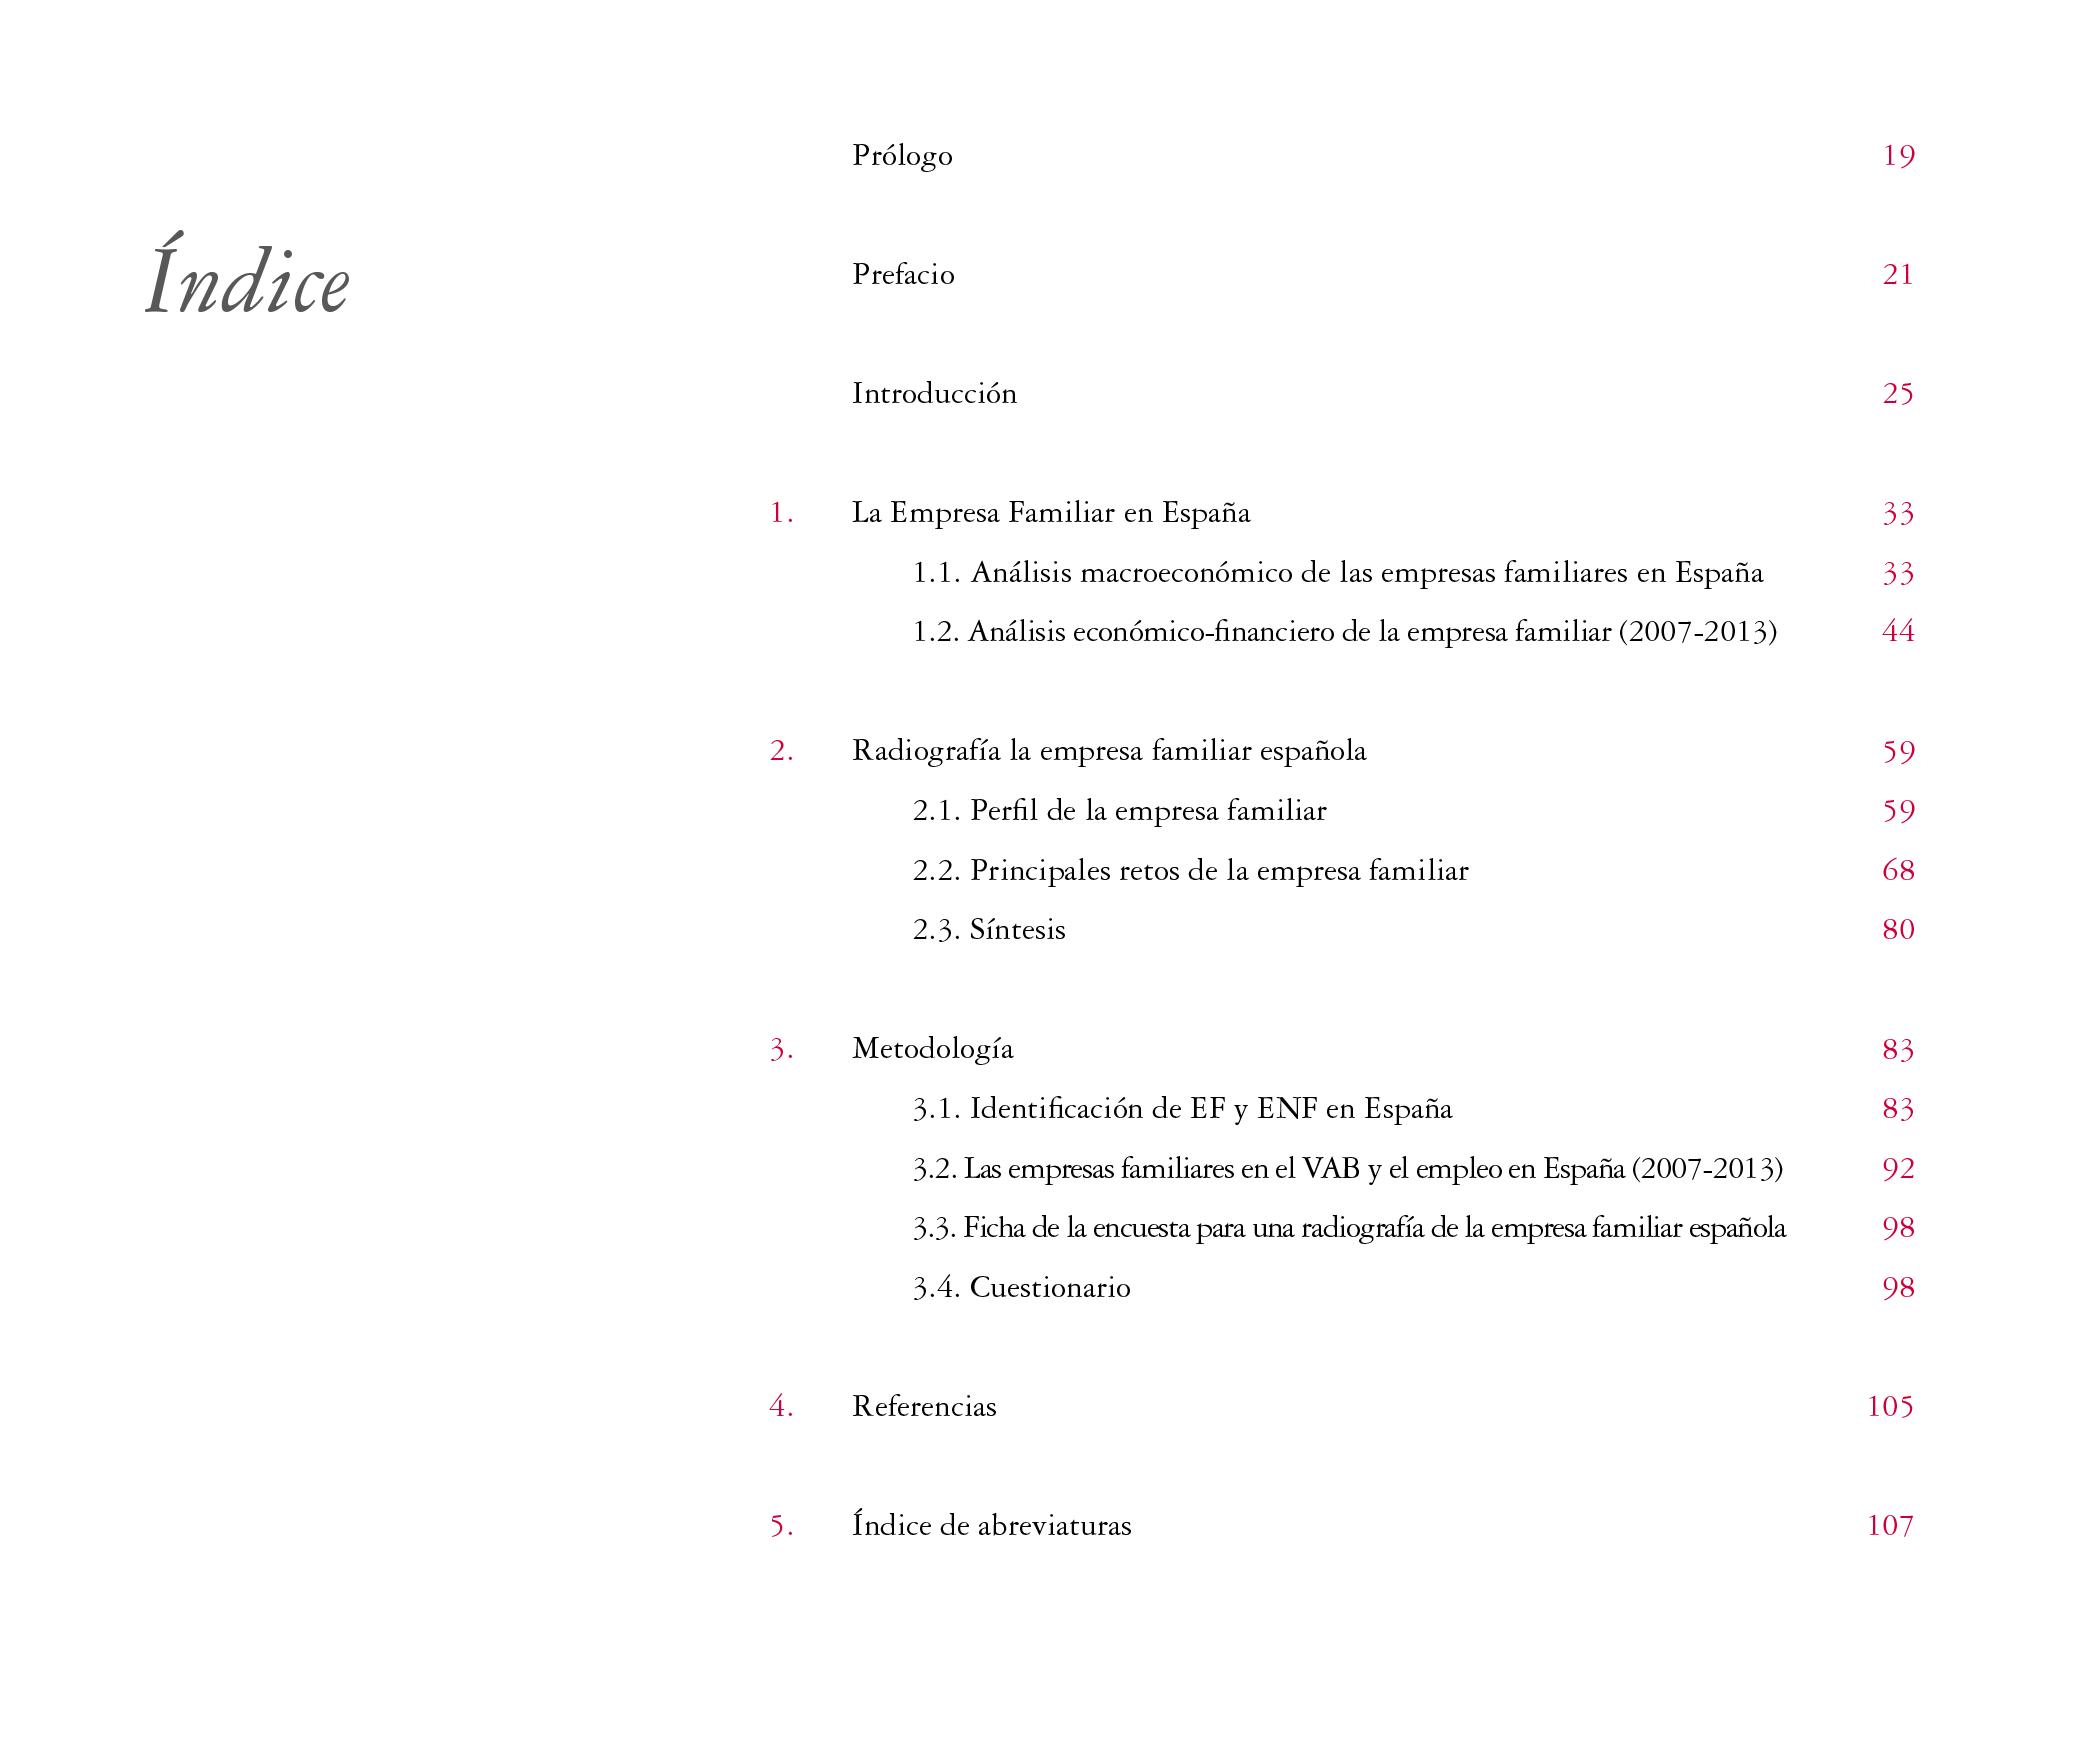 Indice Empresa Familiar 2015